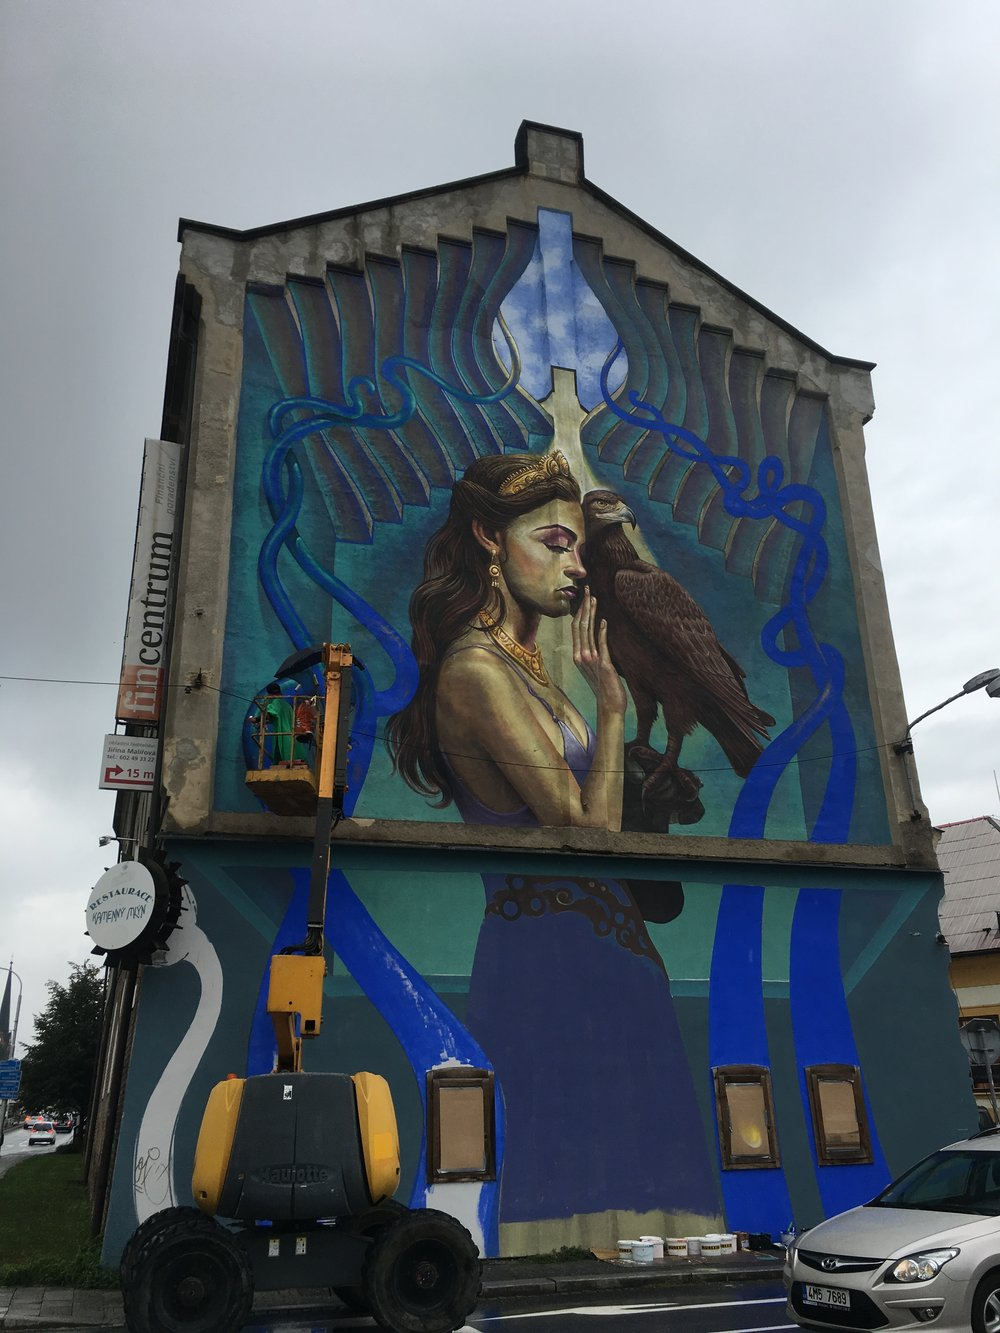 Watching the new street art develop in Olomouc